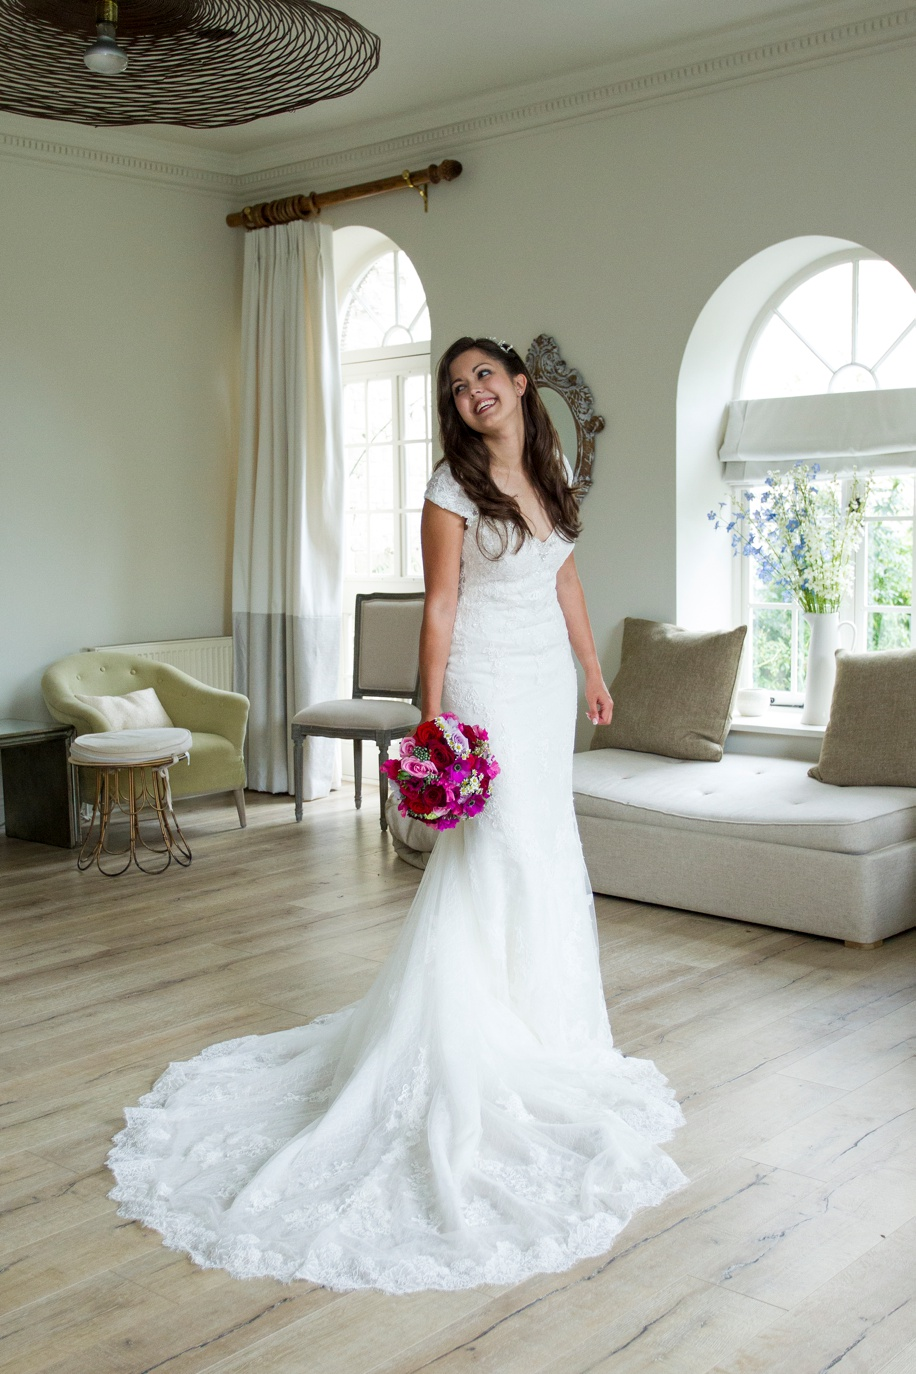 Manor Barn Buriton wedding photography - Beautiful photograph of the Bride